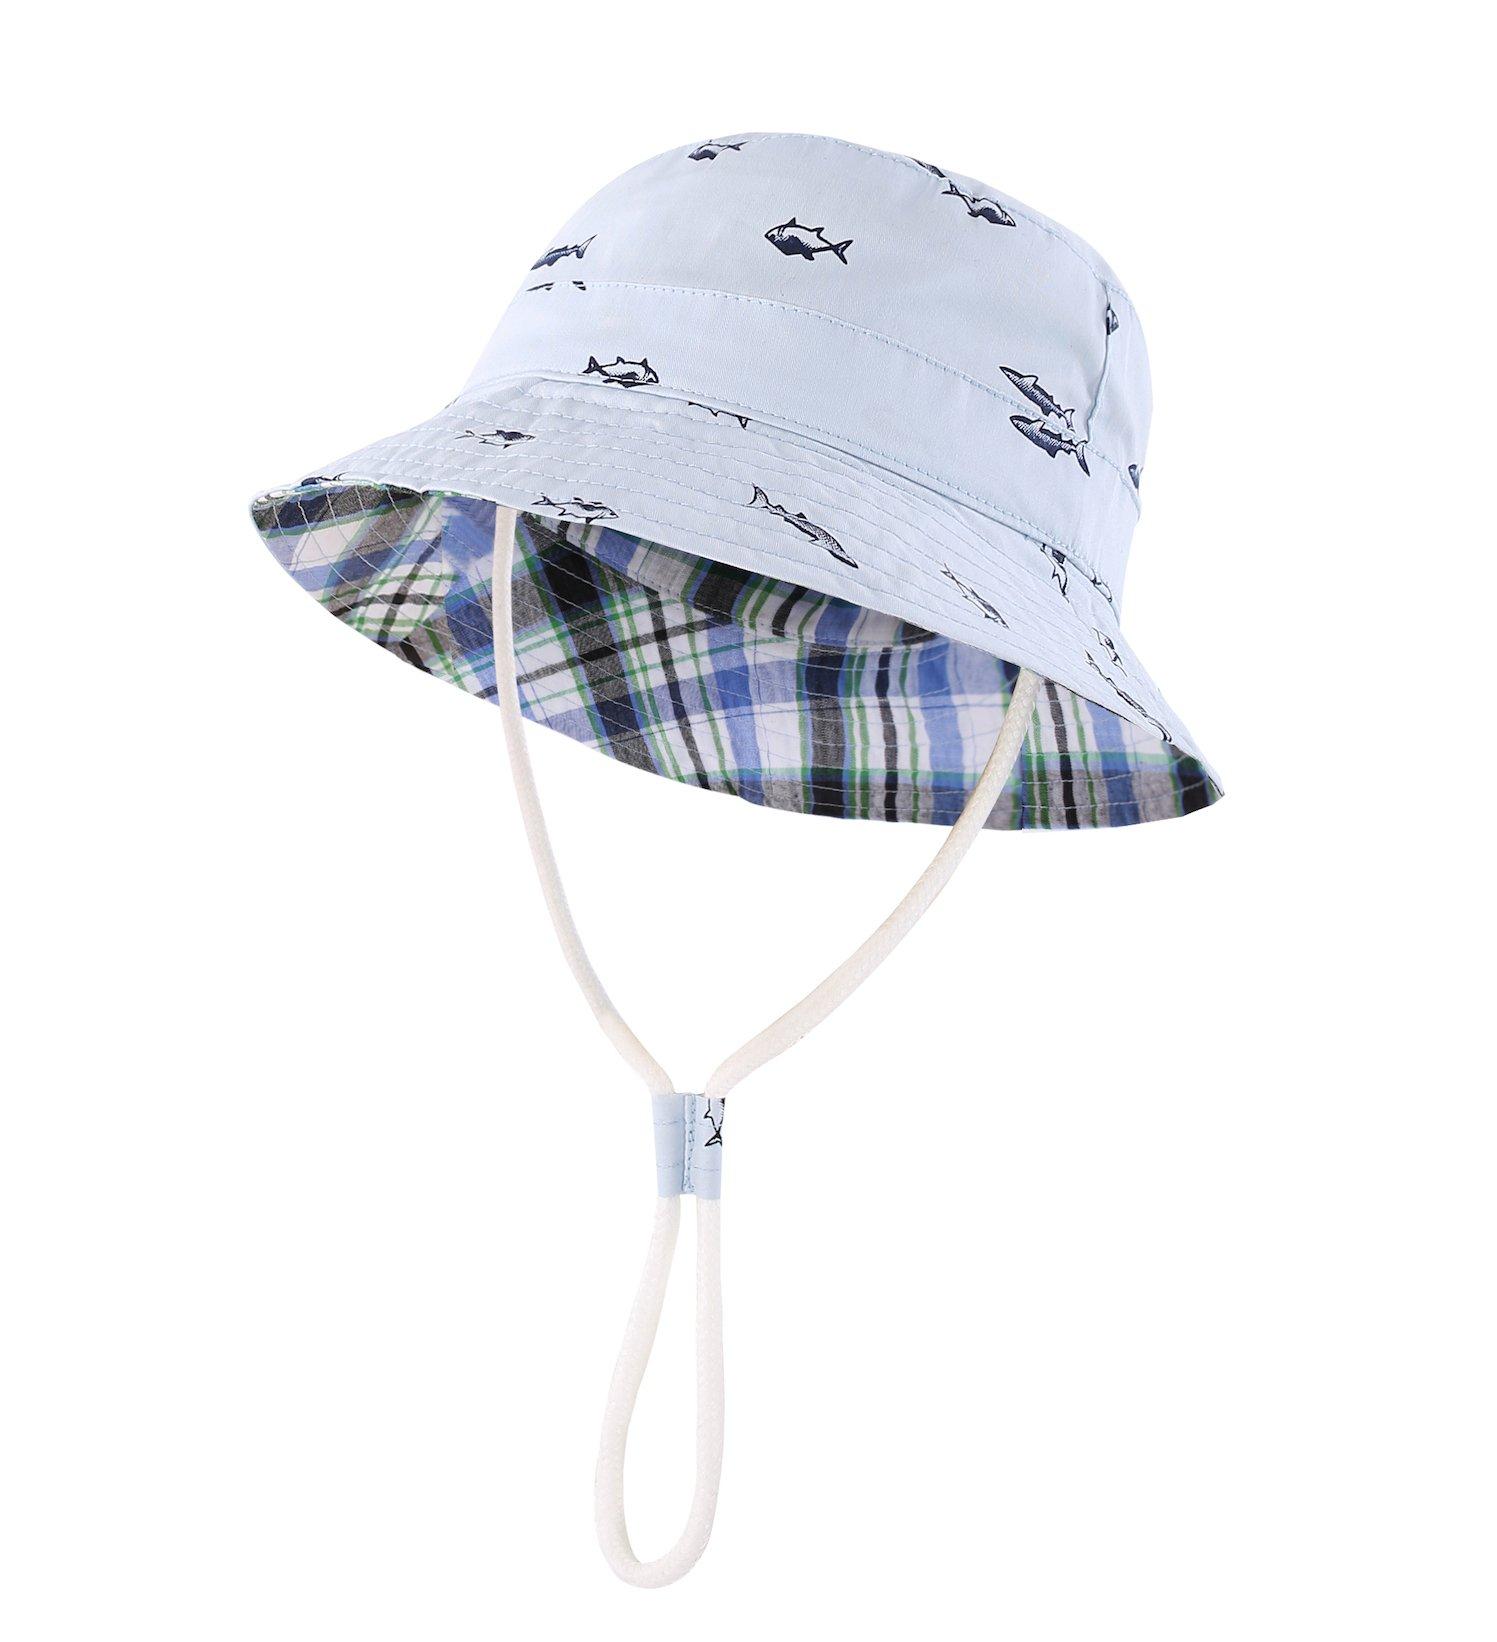 Home Prefer UPF 50+ Little Kids Safari Sun Hat Beach Bucket Hat for Boys Sun Protection Hat Fish Blue #52